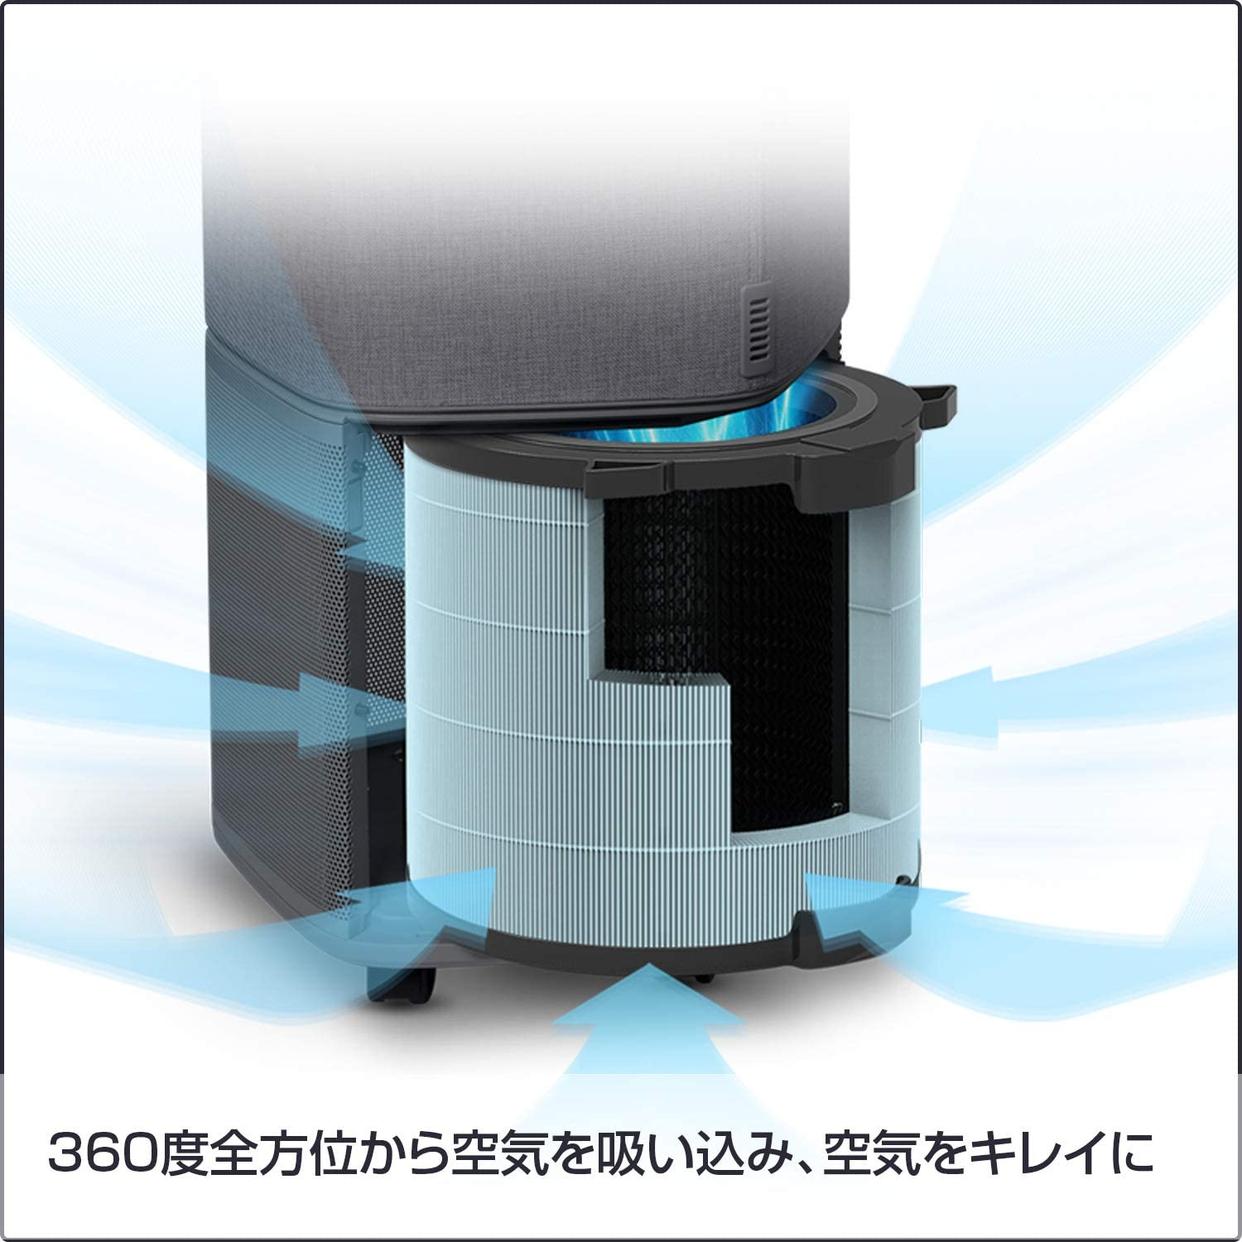 Electrolux(エレクトロラックス) PureA9 空気清浄機  PA91-406の商品画像5